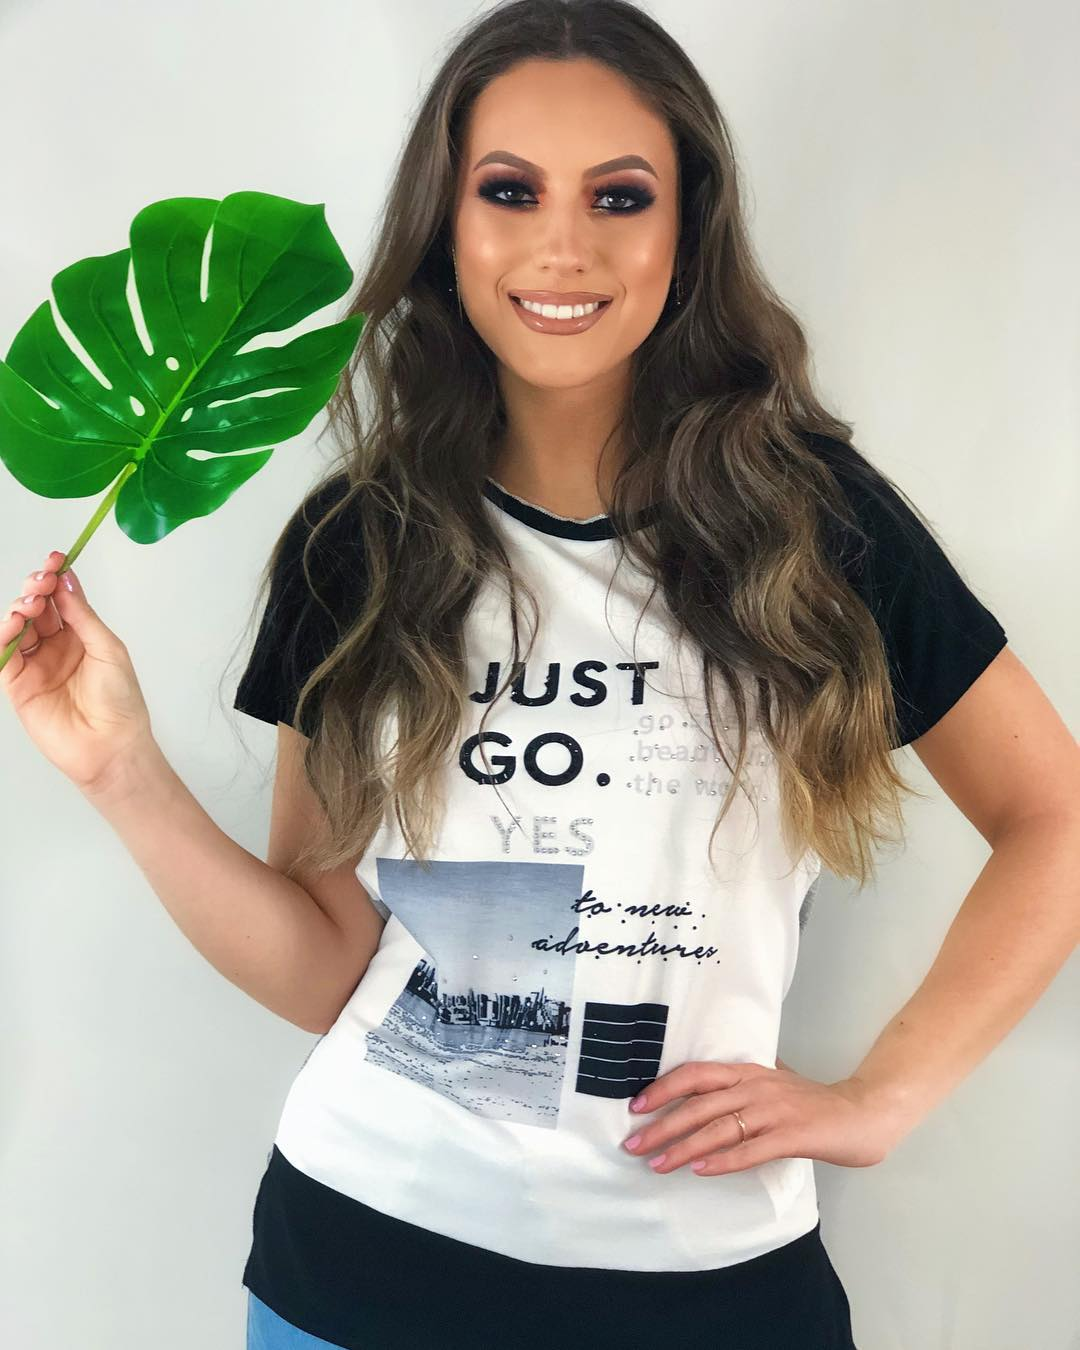 cristine boff sartor, segunda finalista de miss latinoamerica 2019. - Página 4 47128210